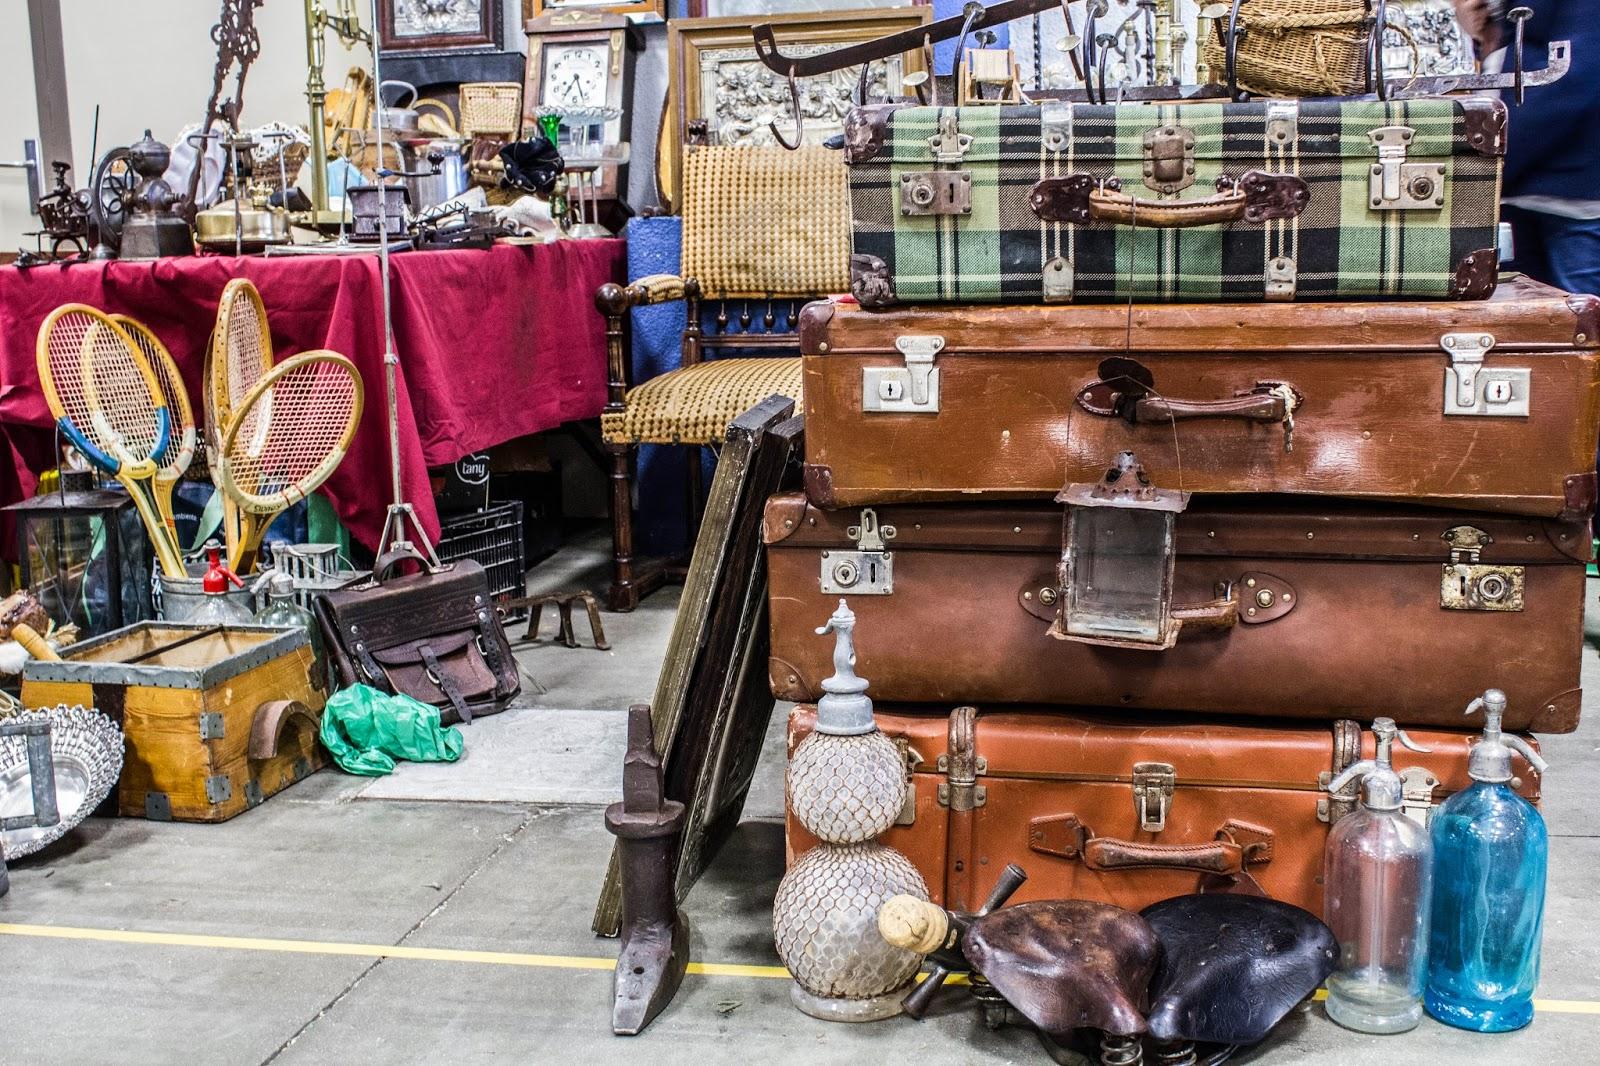 La feria desembalaje madrid regresa con su toque vintage for Feria decoracion madrid